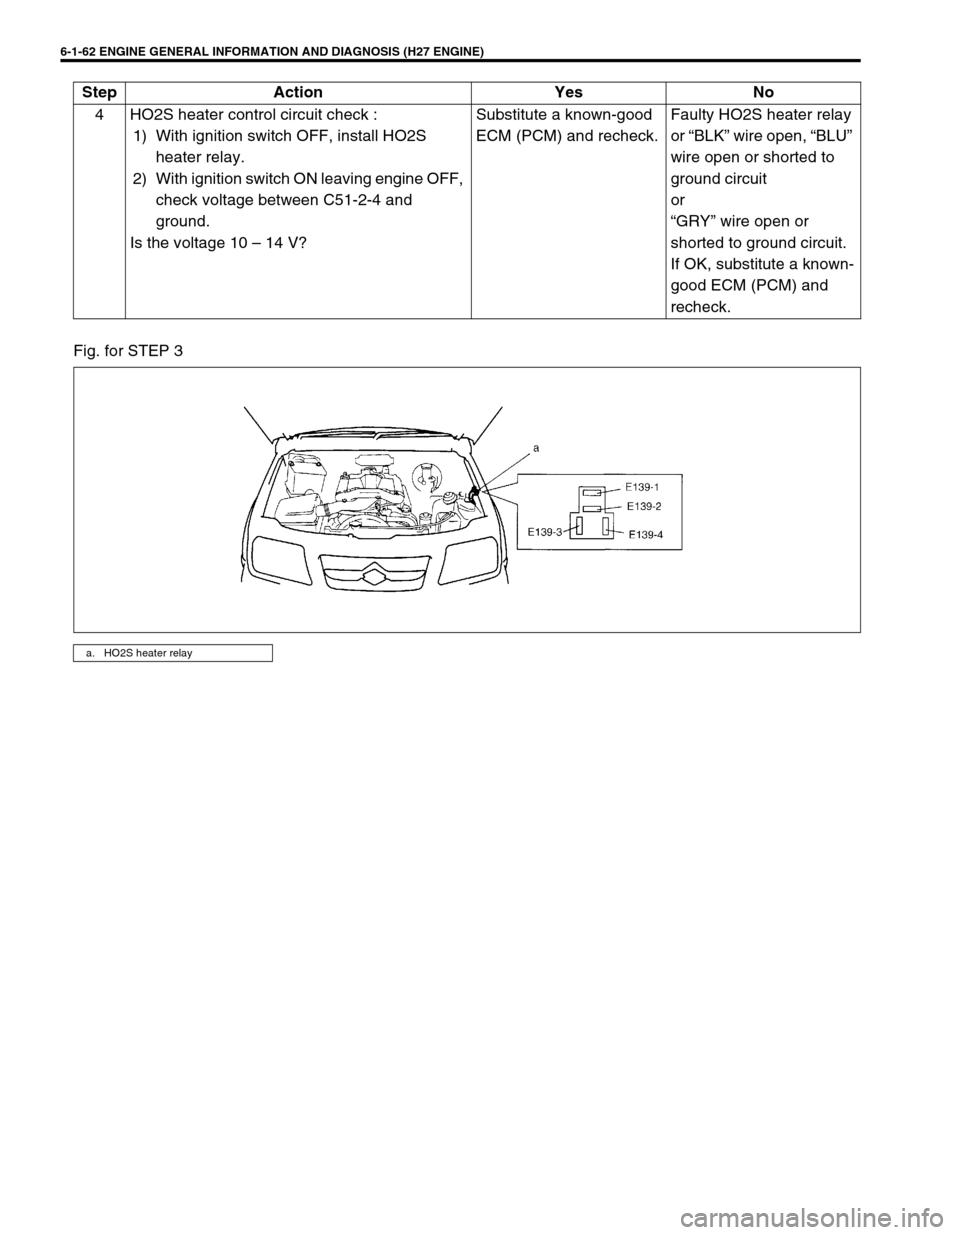 SUZUKI GRAND VITARA 2001 2.G Owners Manual, Page 223